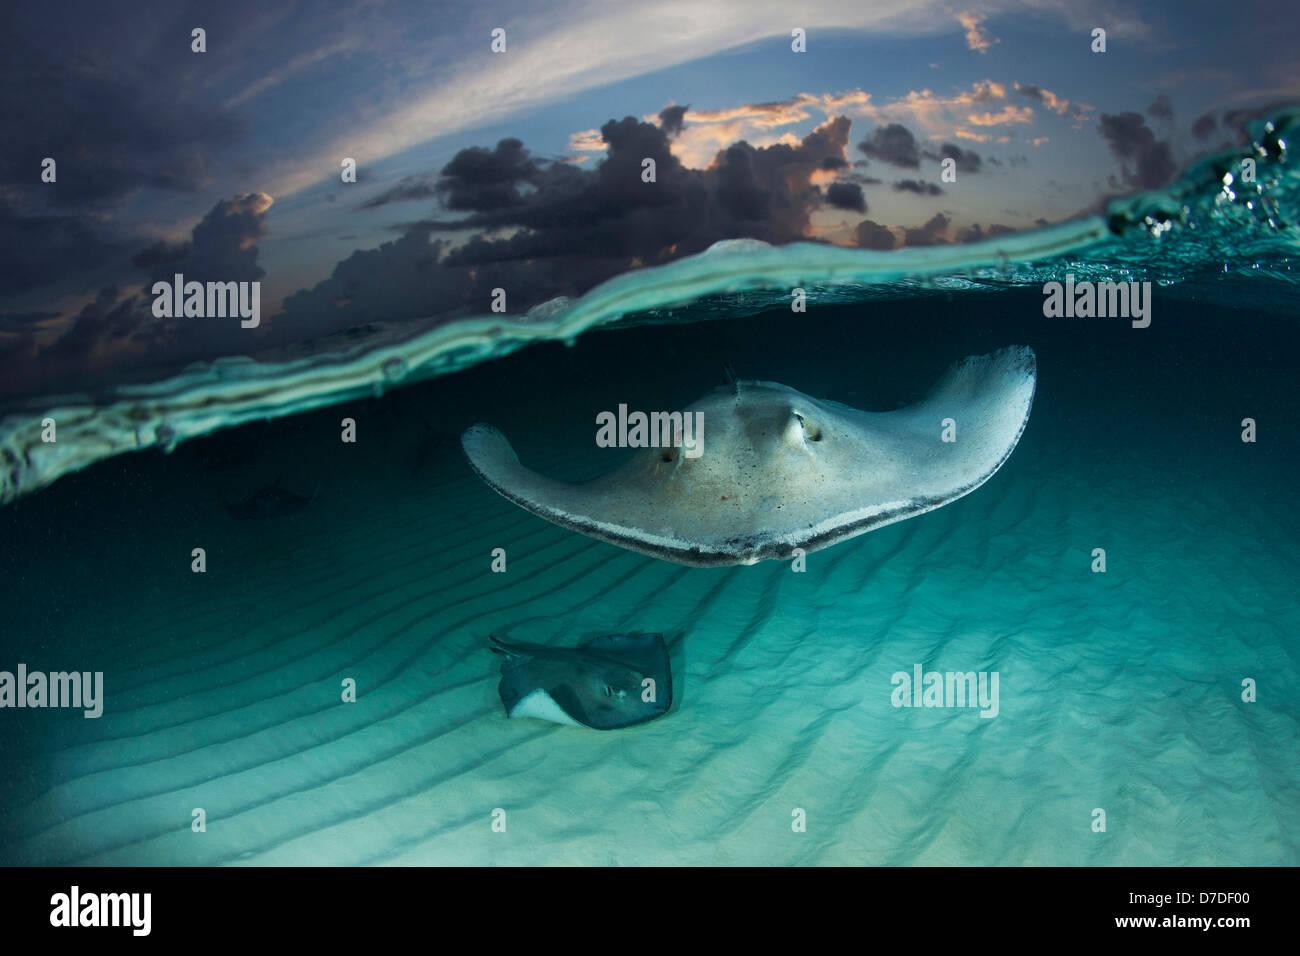 Southern Stingrays, Dasyatis americana, Grand Cayman, Caribbean Sea, Cayman Islands - Stock Image